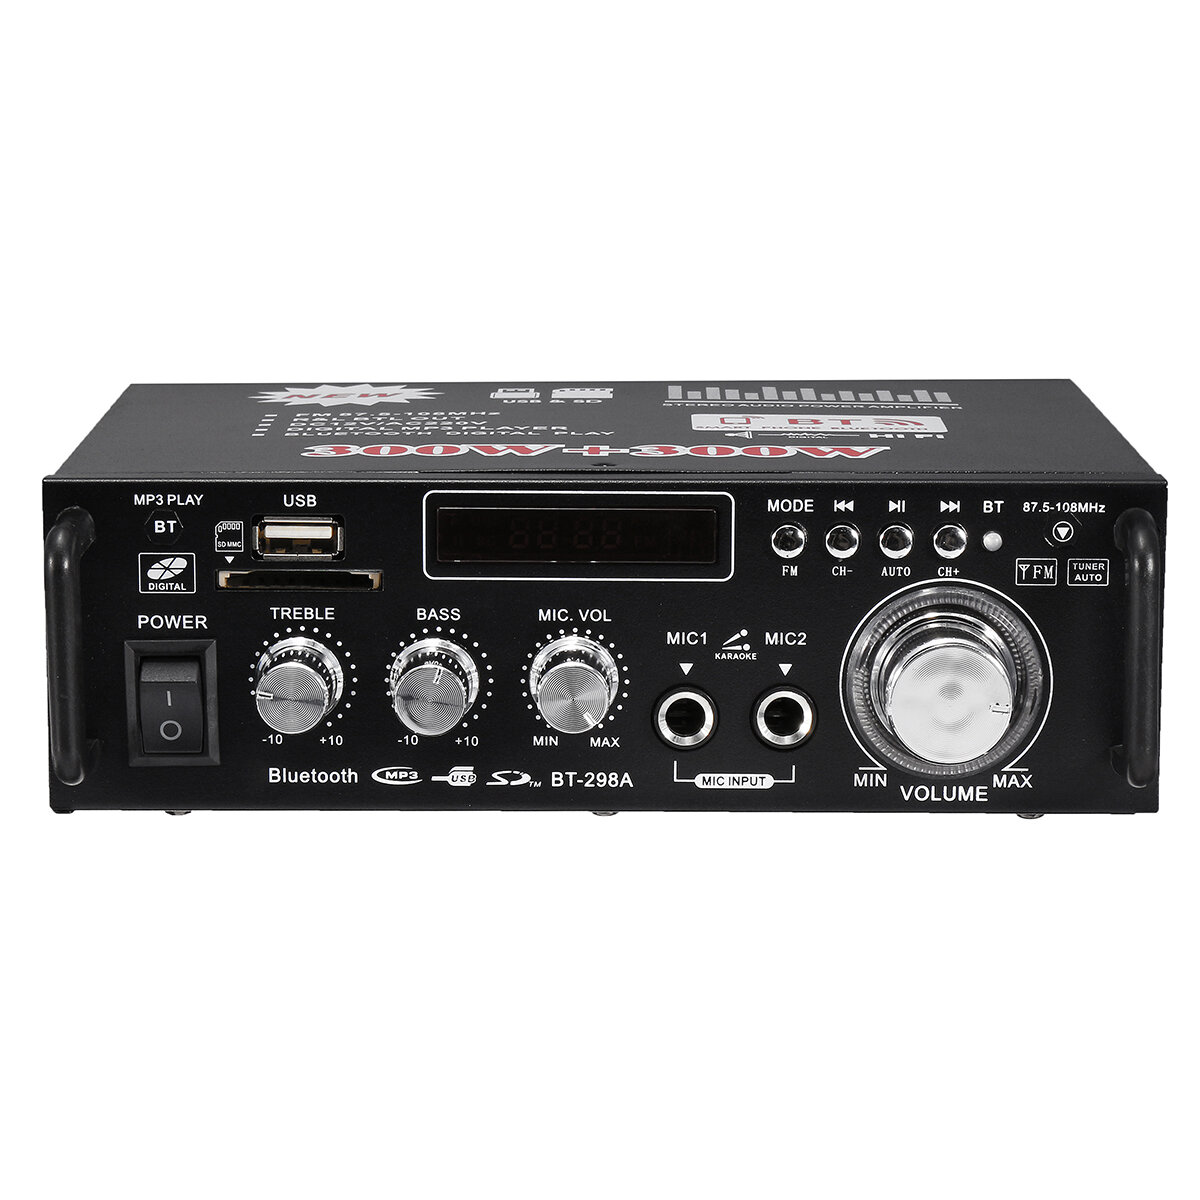 BT-298A 12V 220V HIFI Audio Stereo Power Amplifier bluetooth FM Radio 2CH 600W